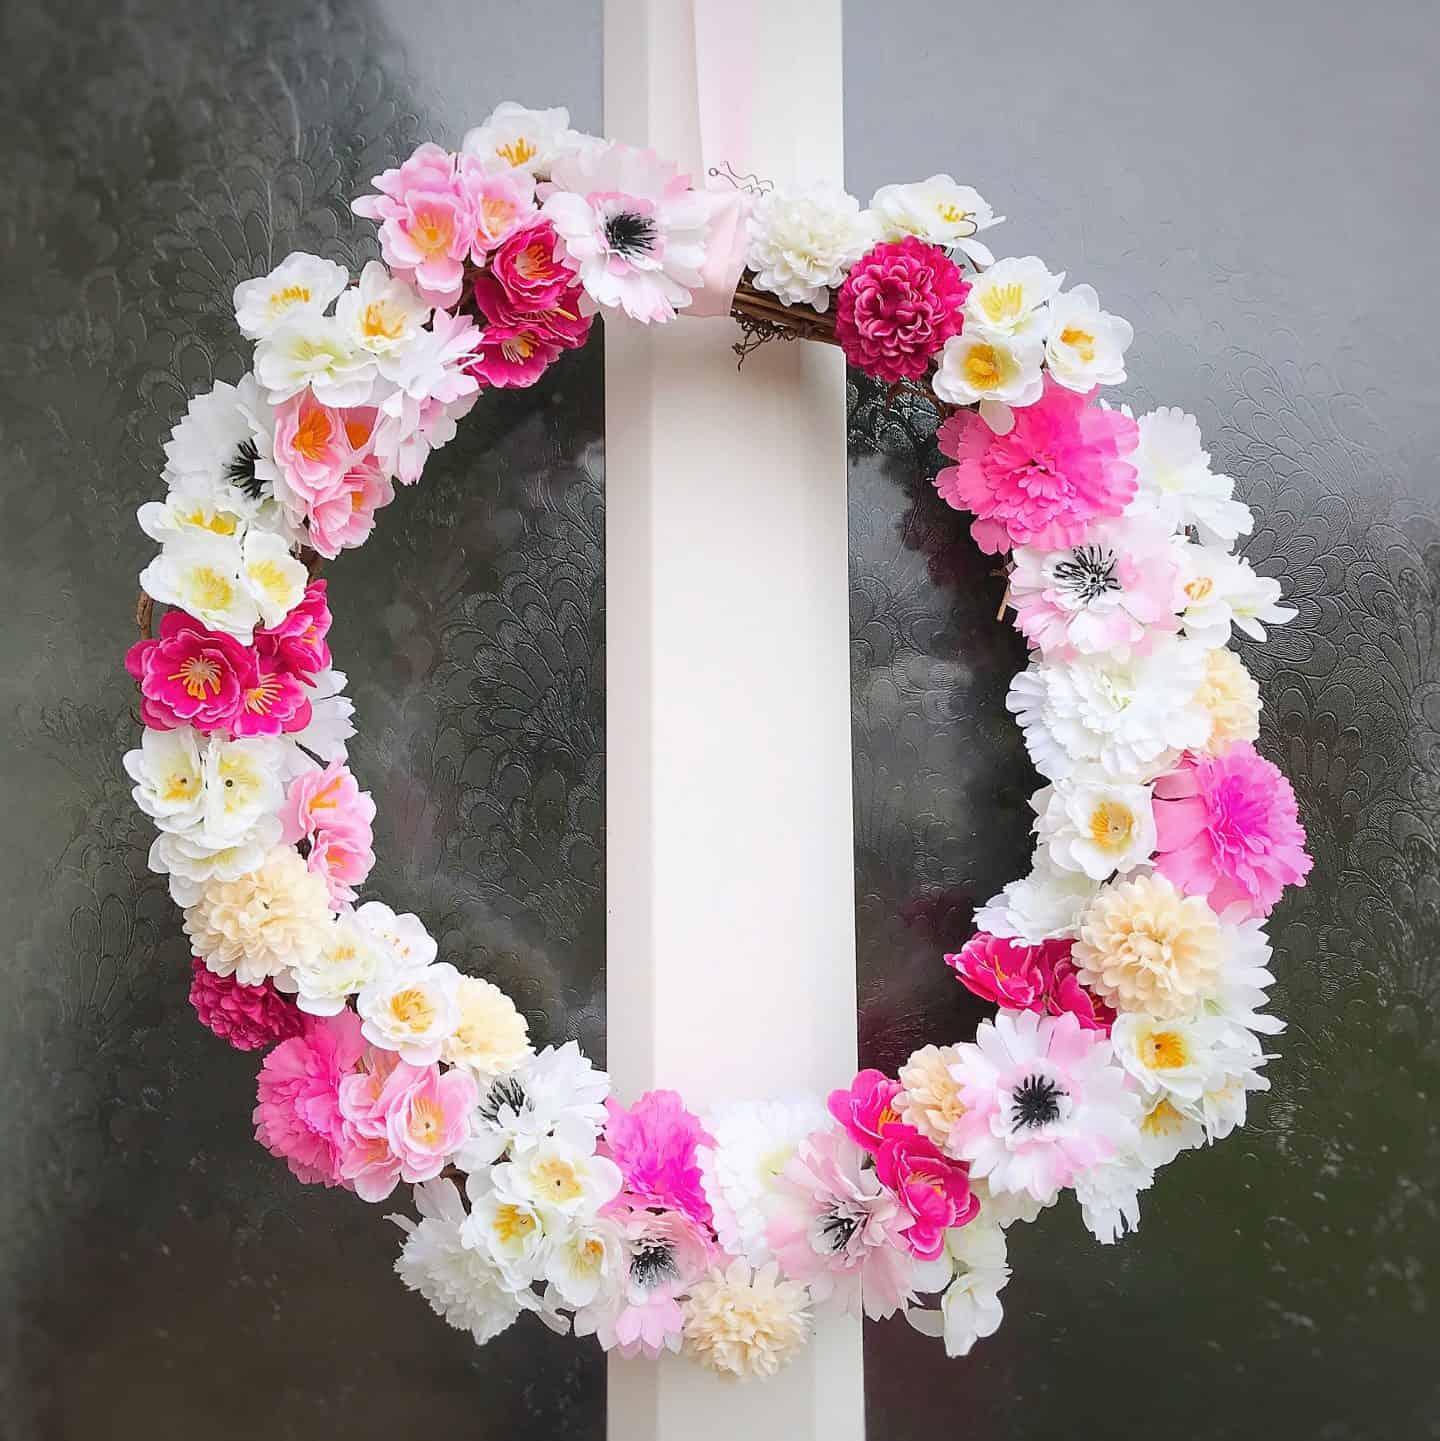 Easy spring wreath on a front door